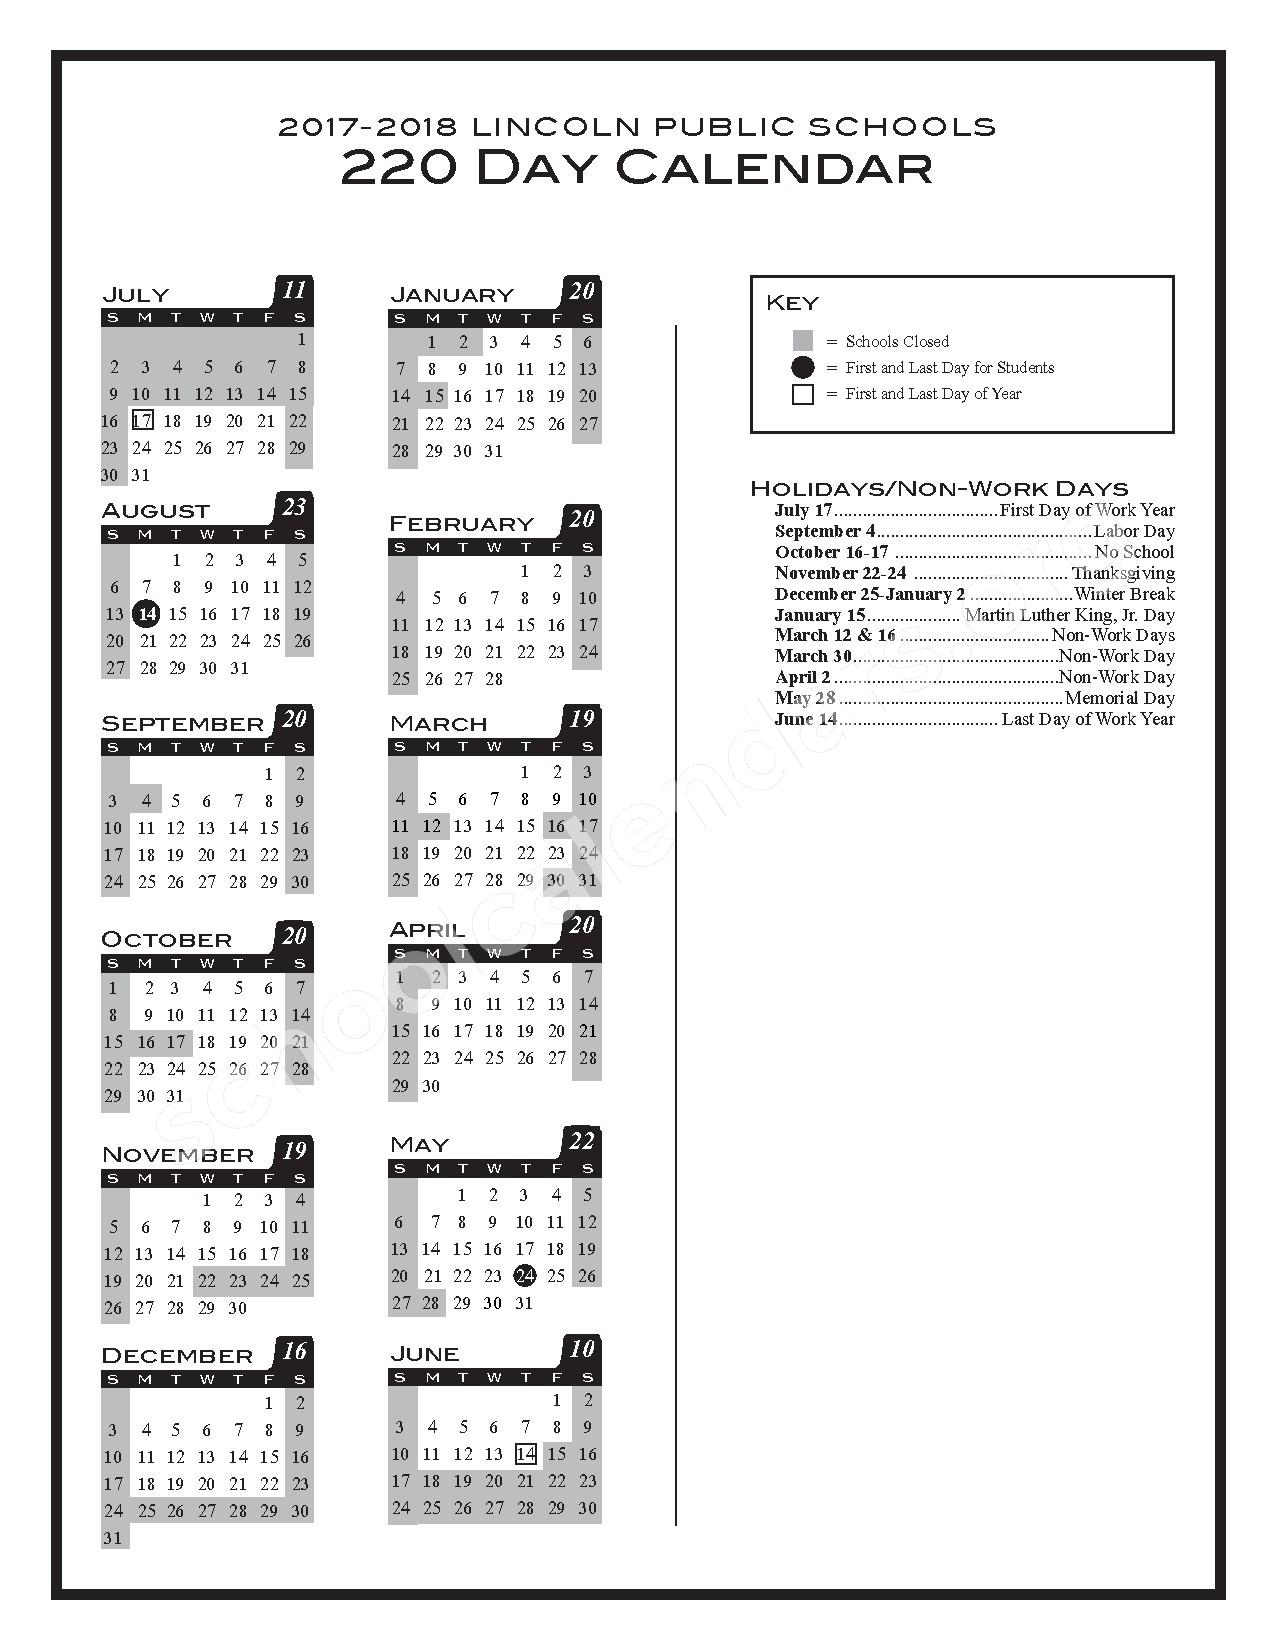 2017 - 2018 220-day Calendar – Lincoln Public Schools – page 1